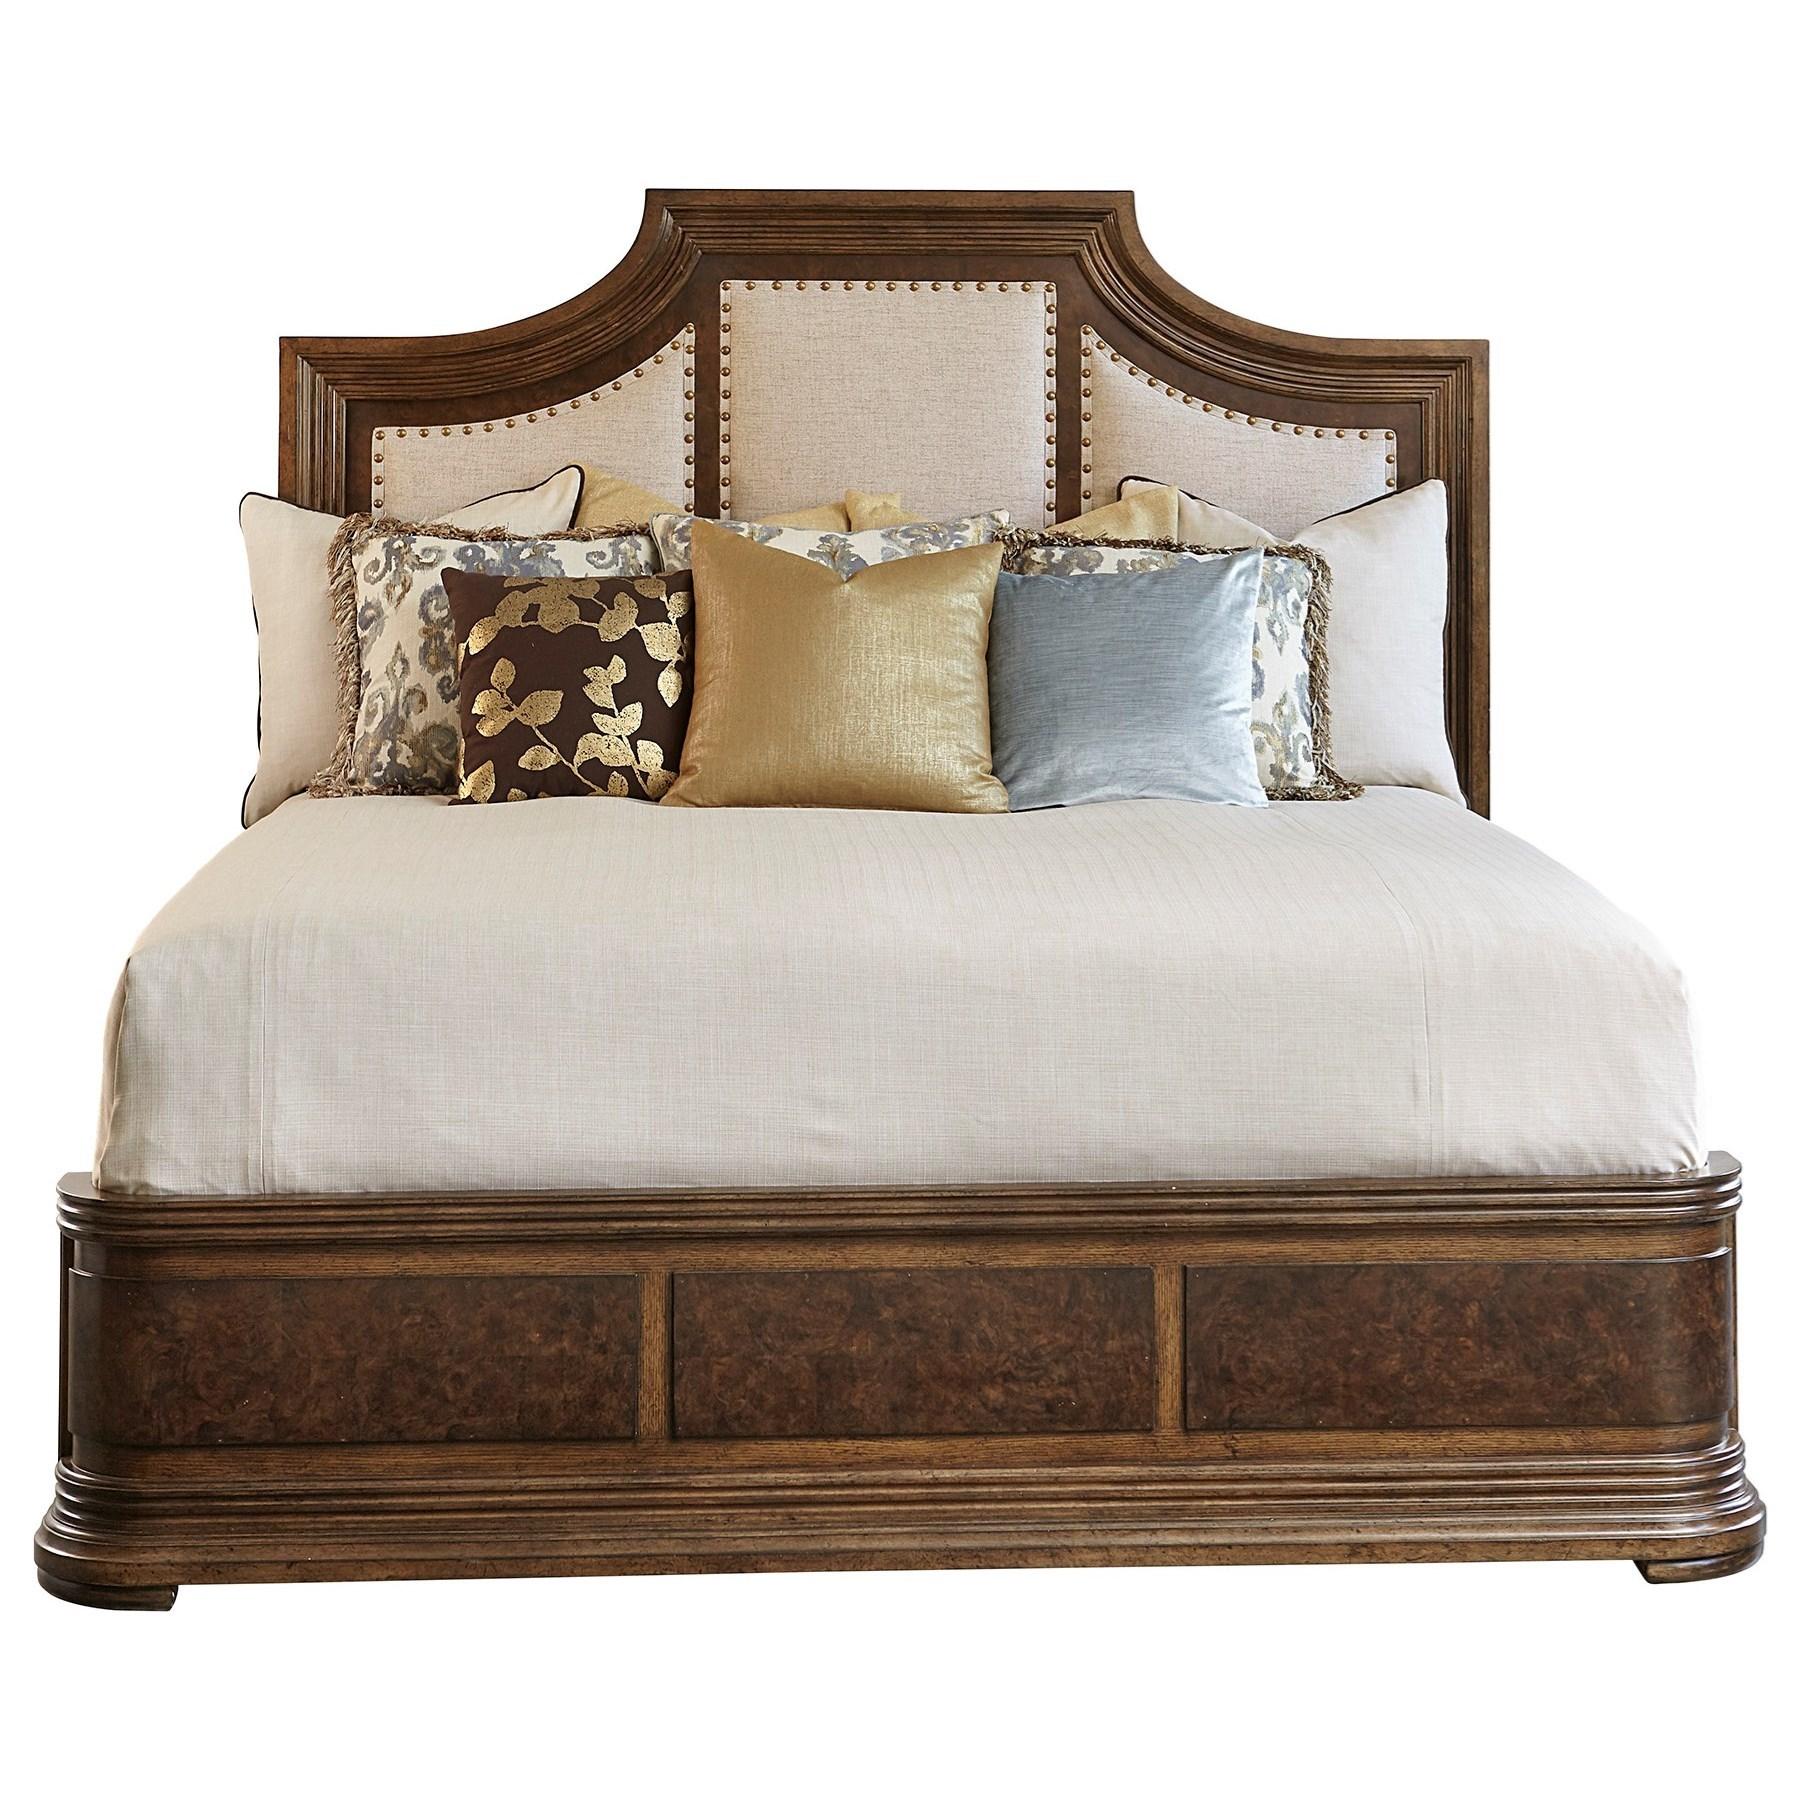 Kingsport  Queen Upholstered Panel Bed  by Klien Furniture at Sprintz Furniture